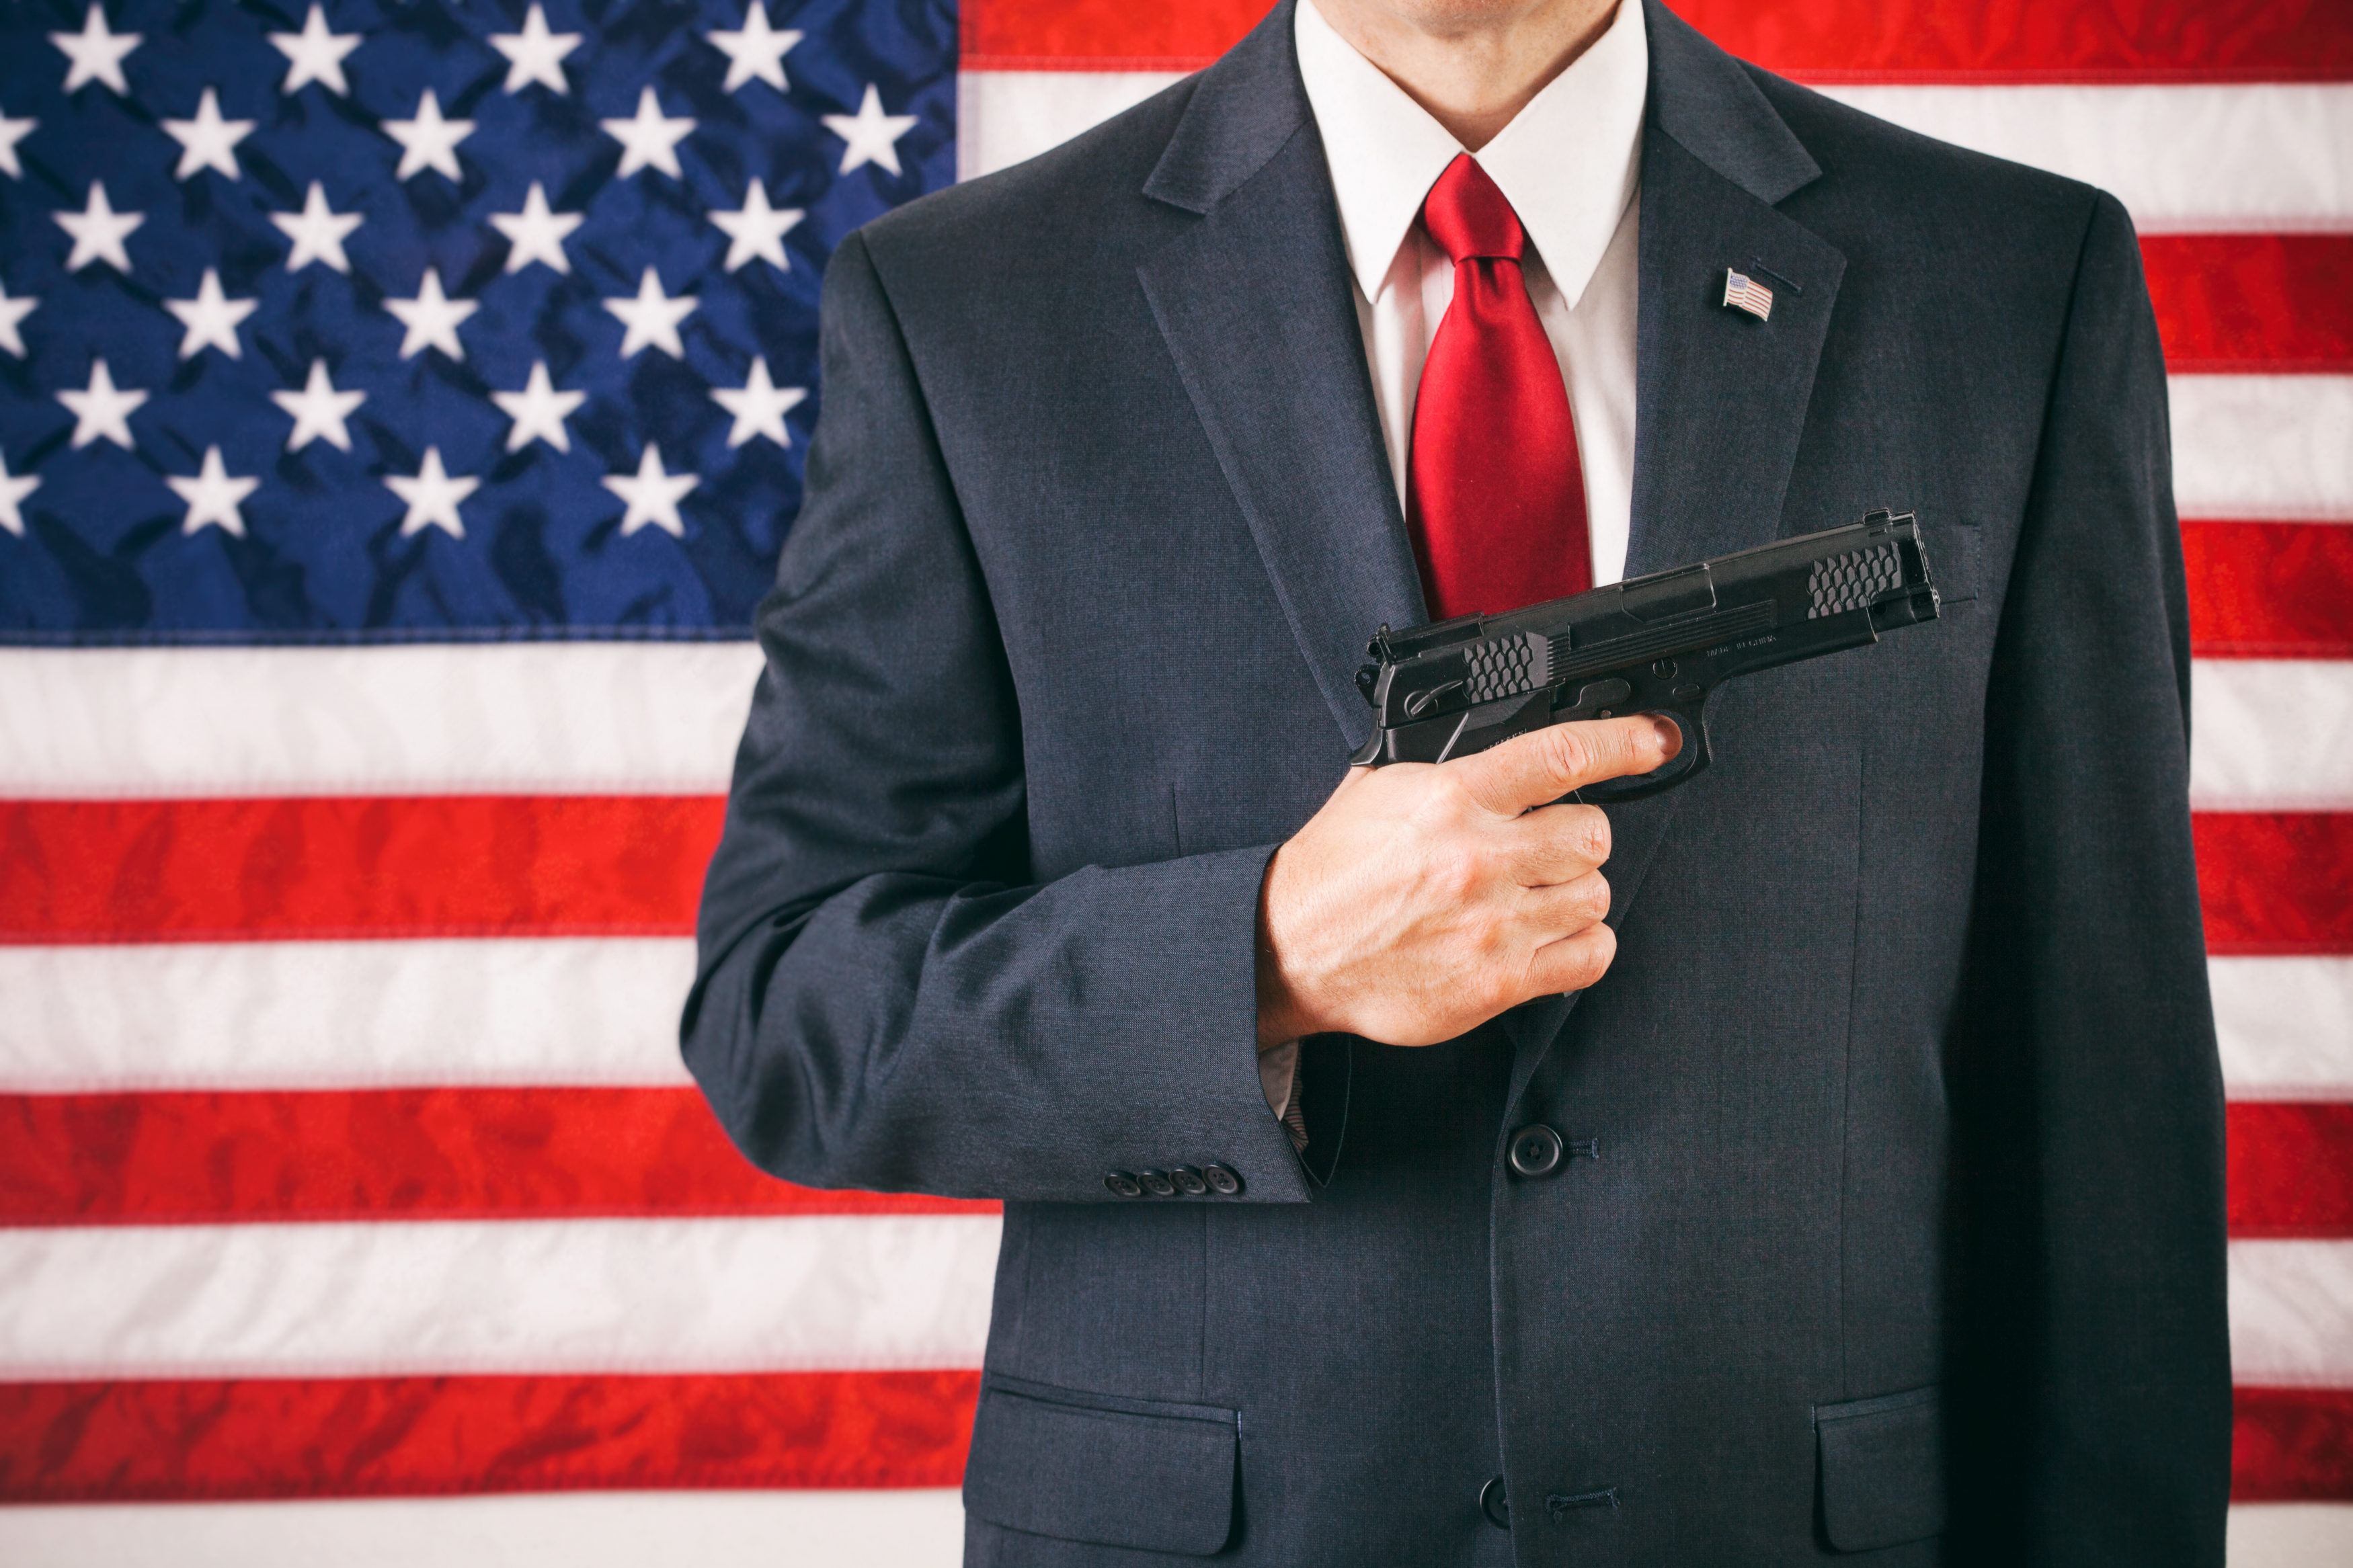 us-flag-guns-3500x2333.jpeg